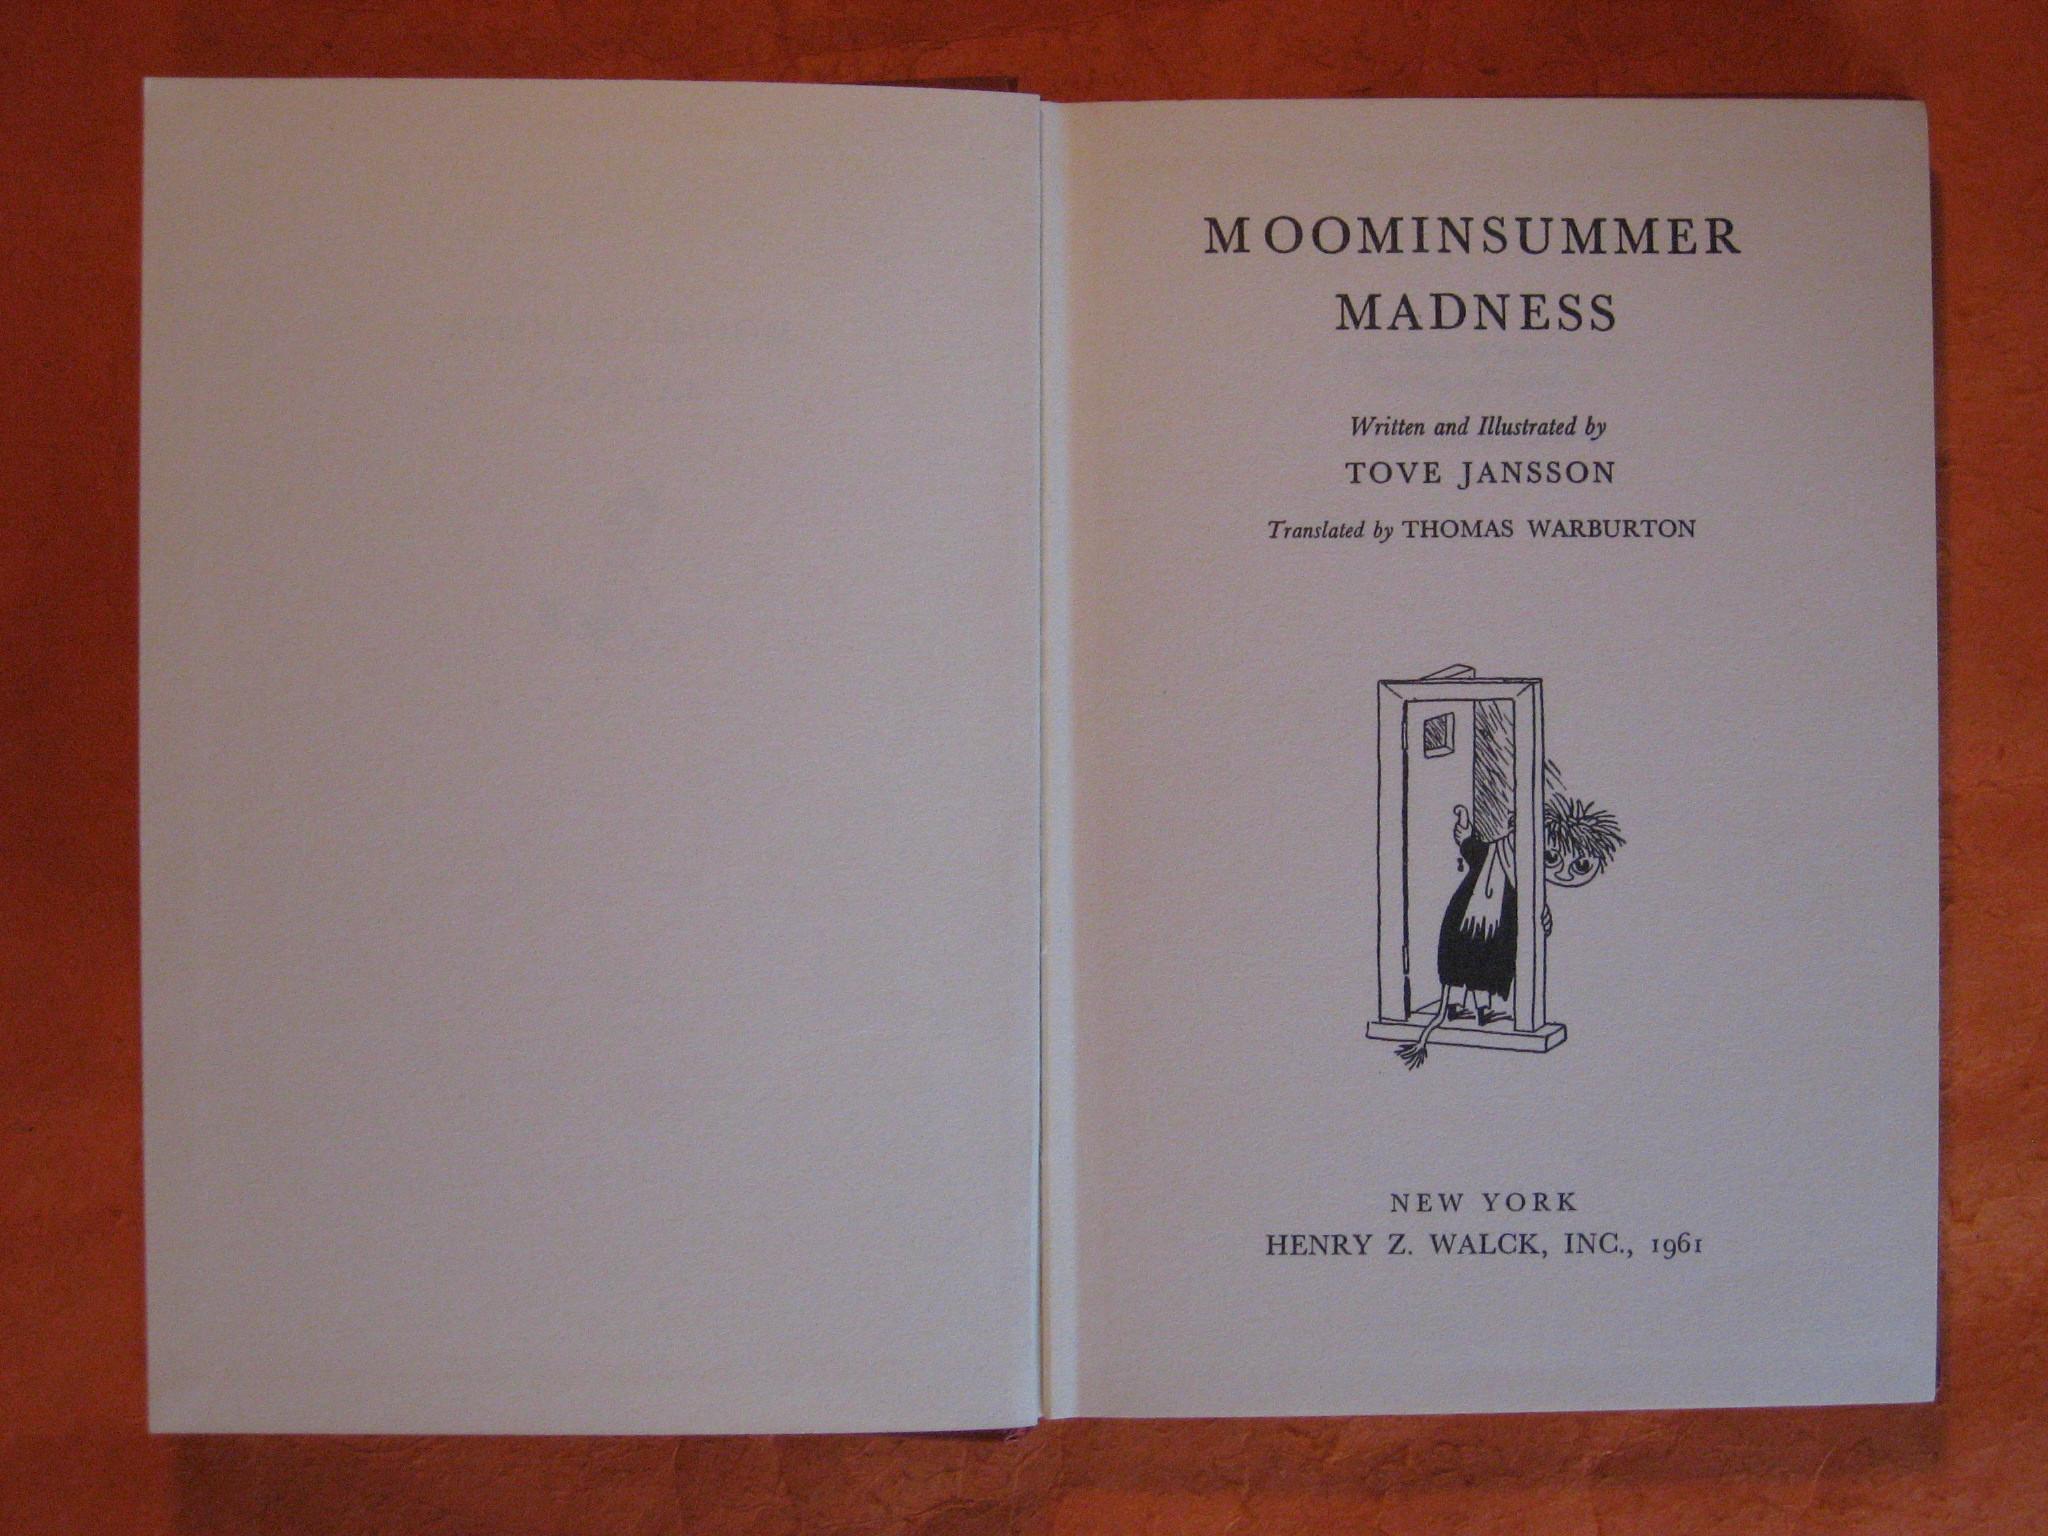 Moominsummer Madness, Jansson, Tove; Warburton Thomas (Translator)